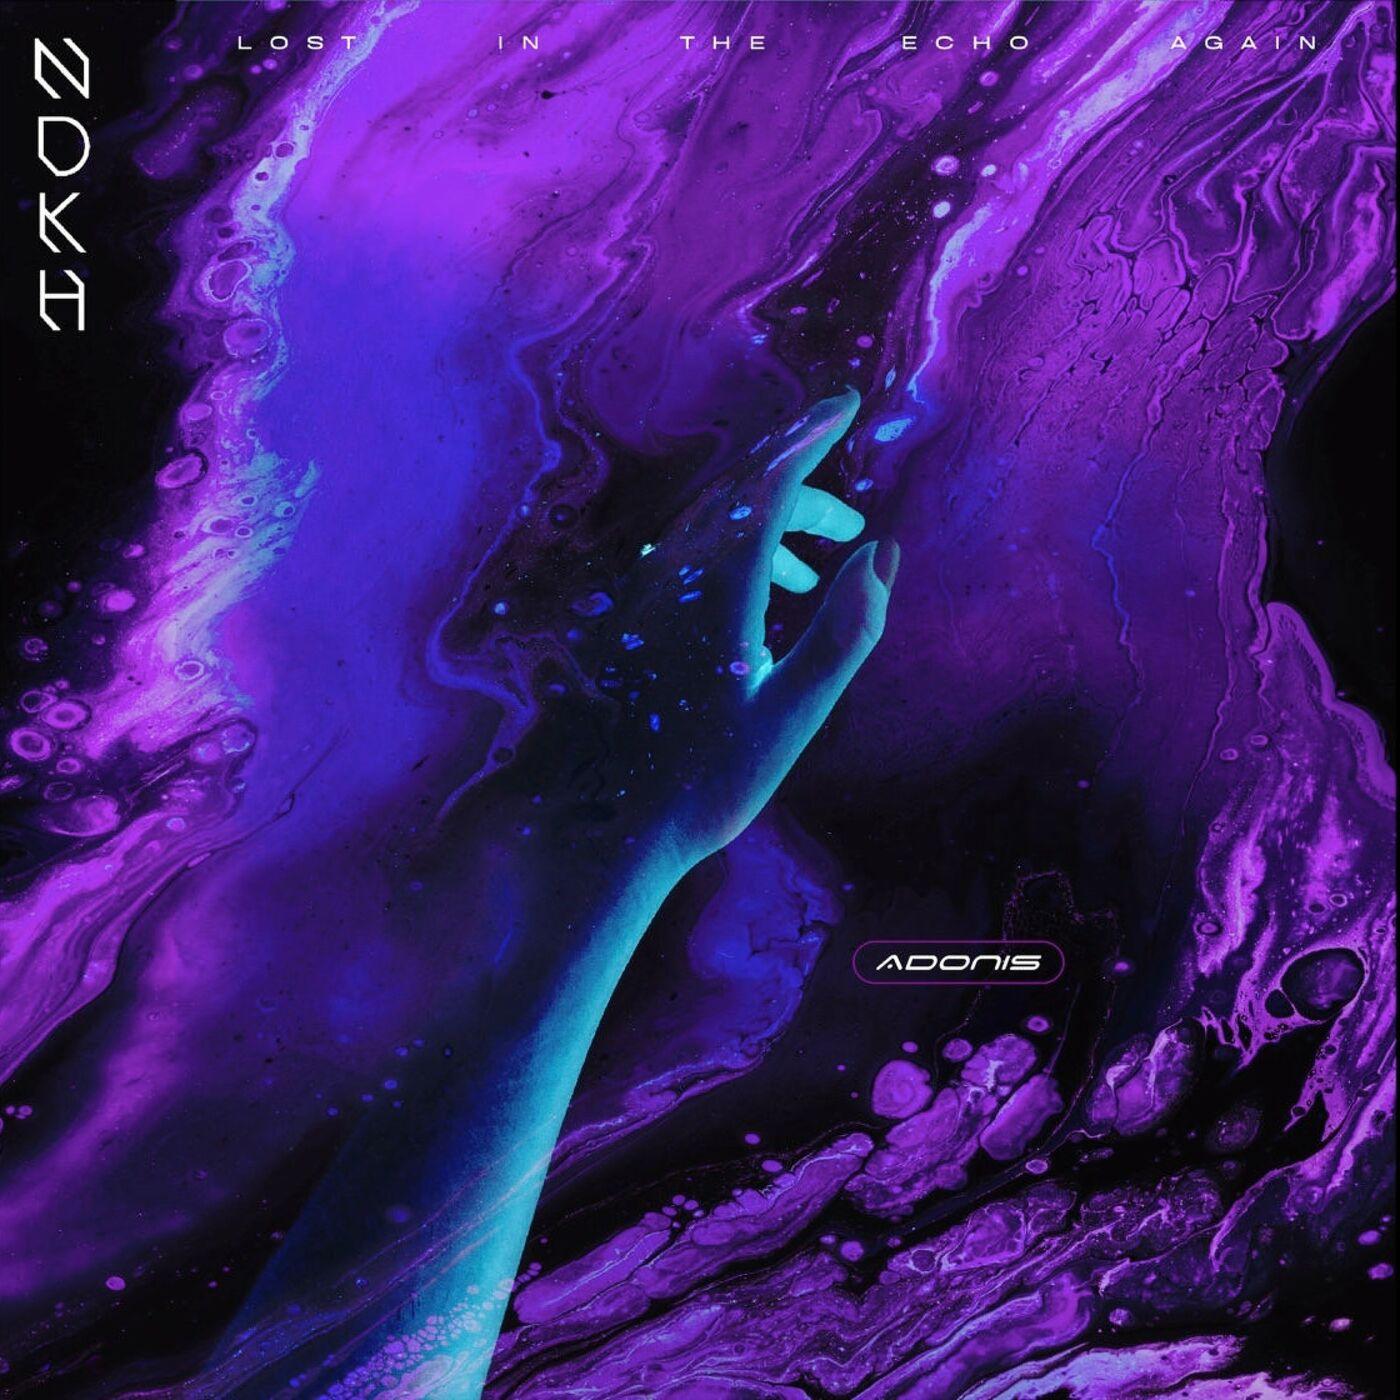 NDKH - Adonis [single] (2021)